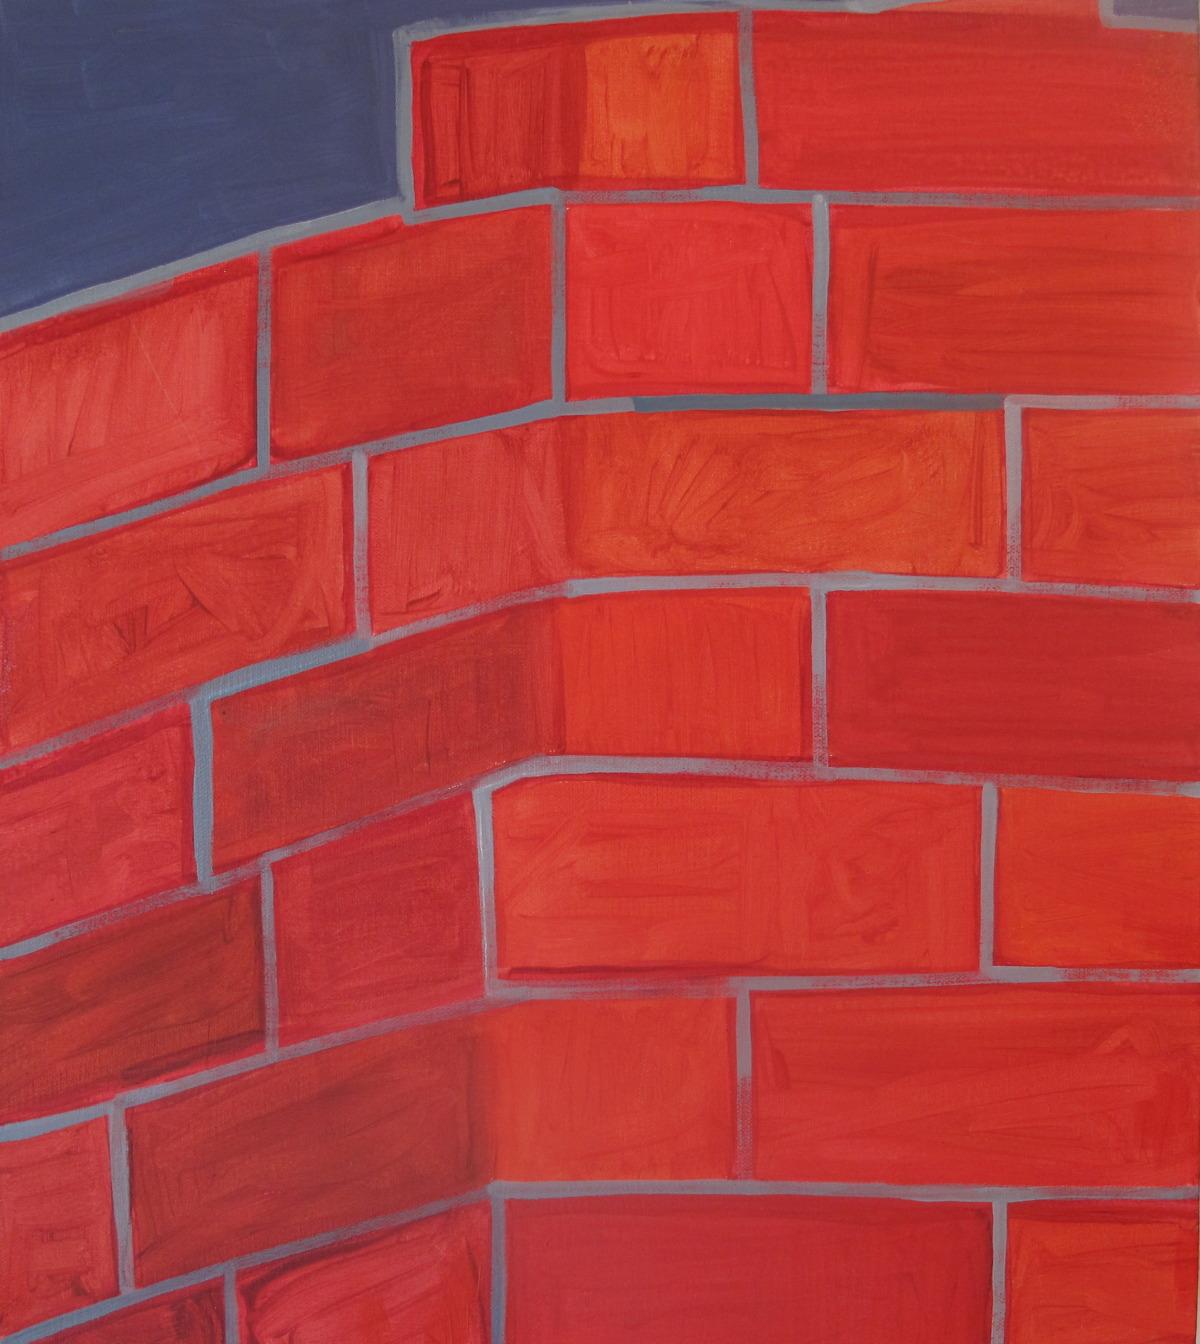 "Bricks. 2009. Oil on Canvas. 16"" x 14"""